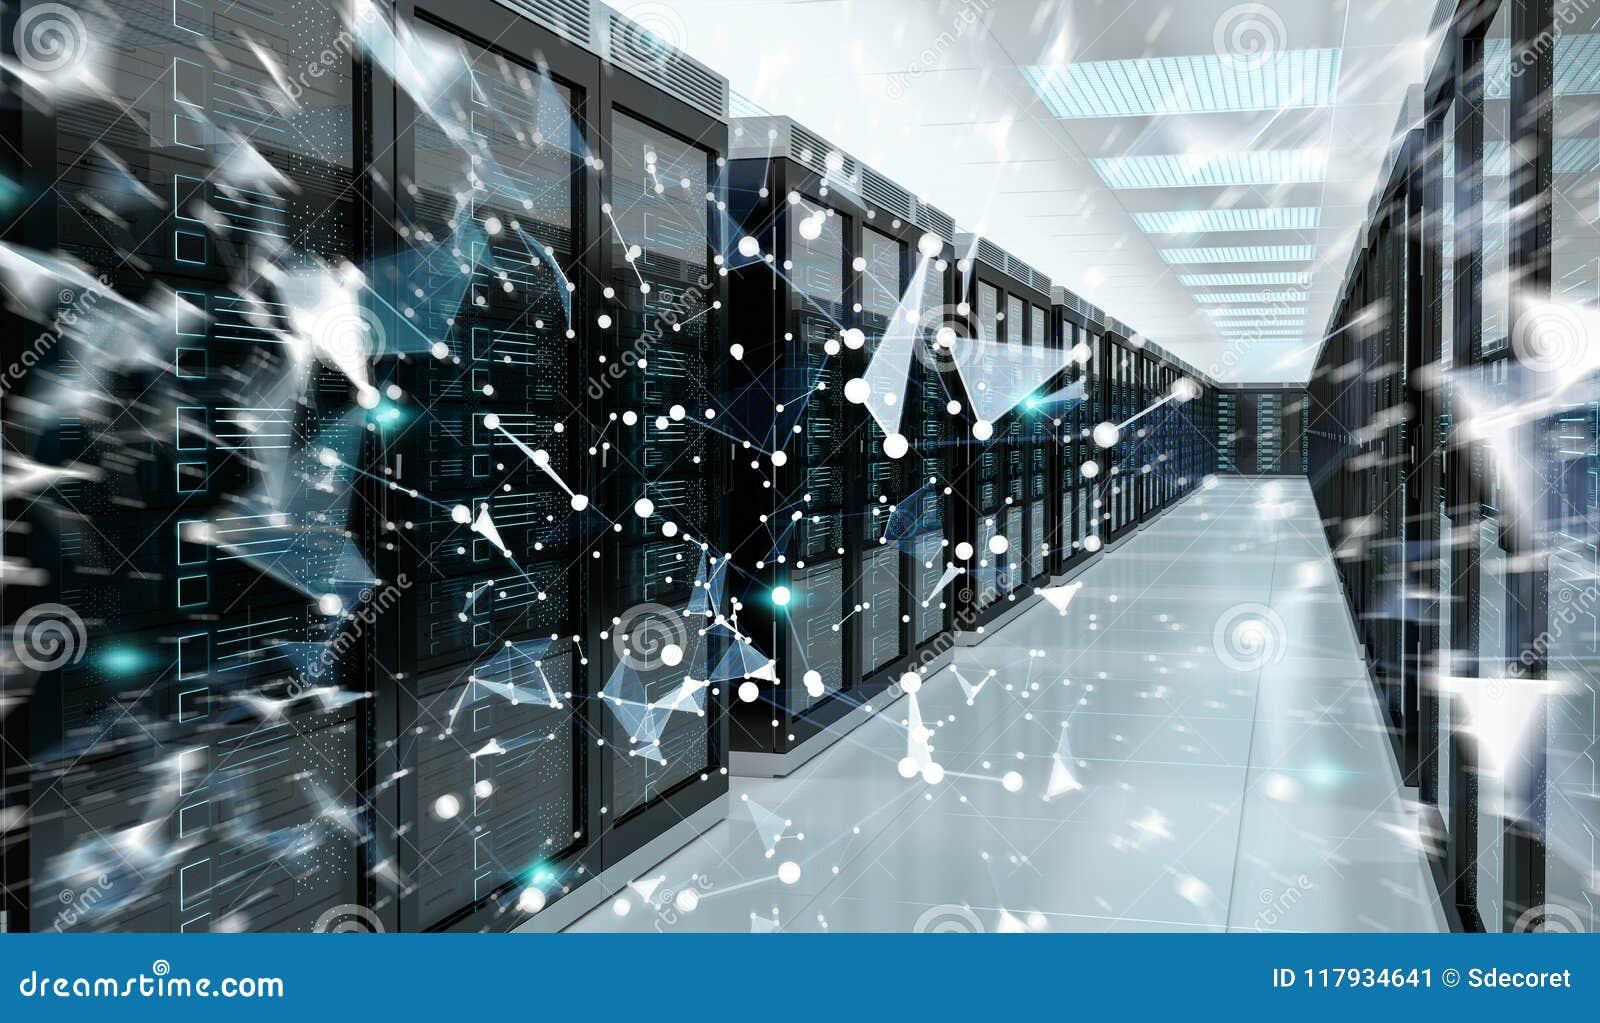 Server room center exchanging cyber datas 3D rendering